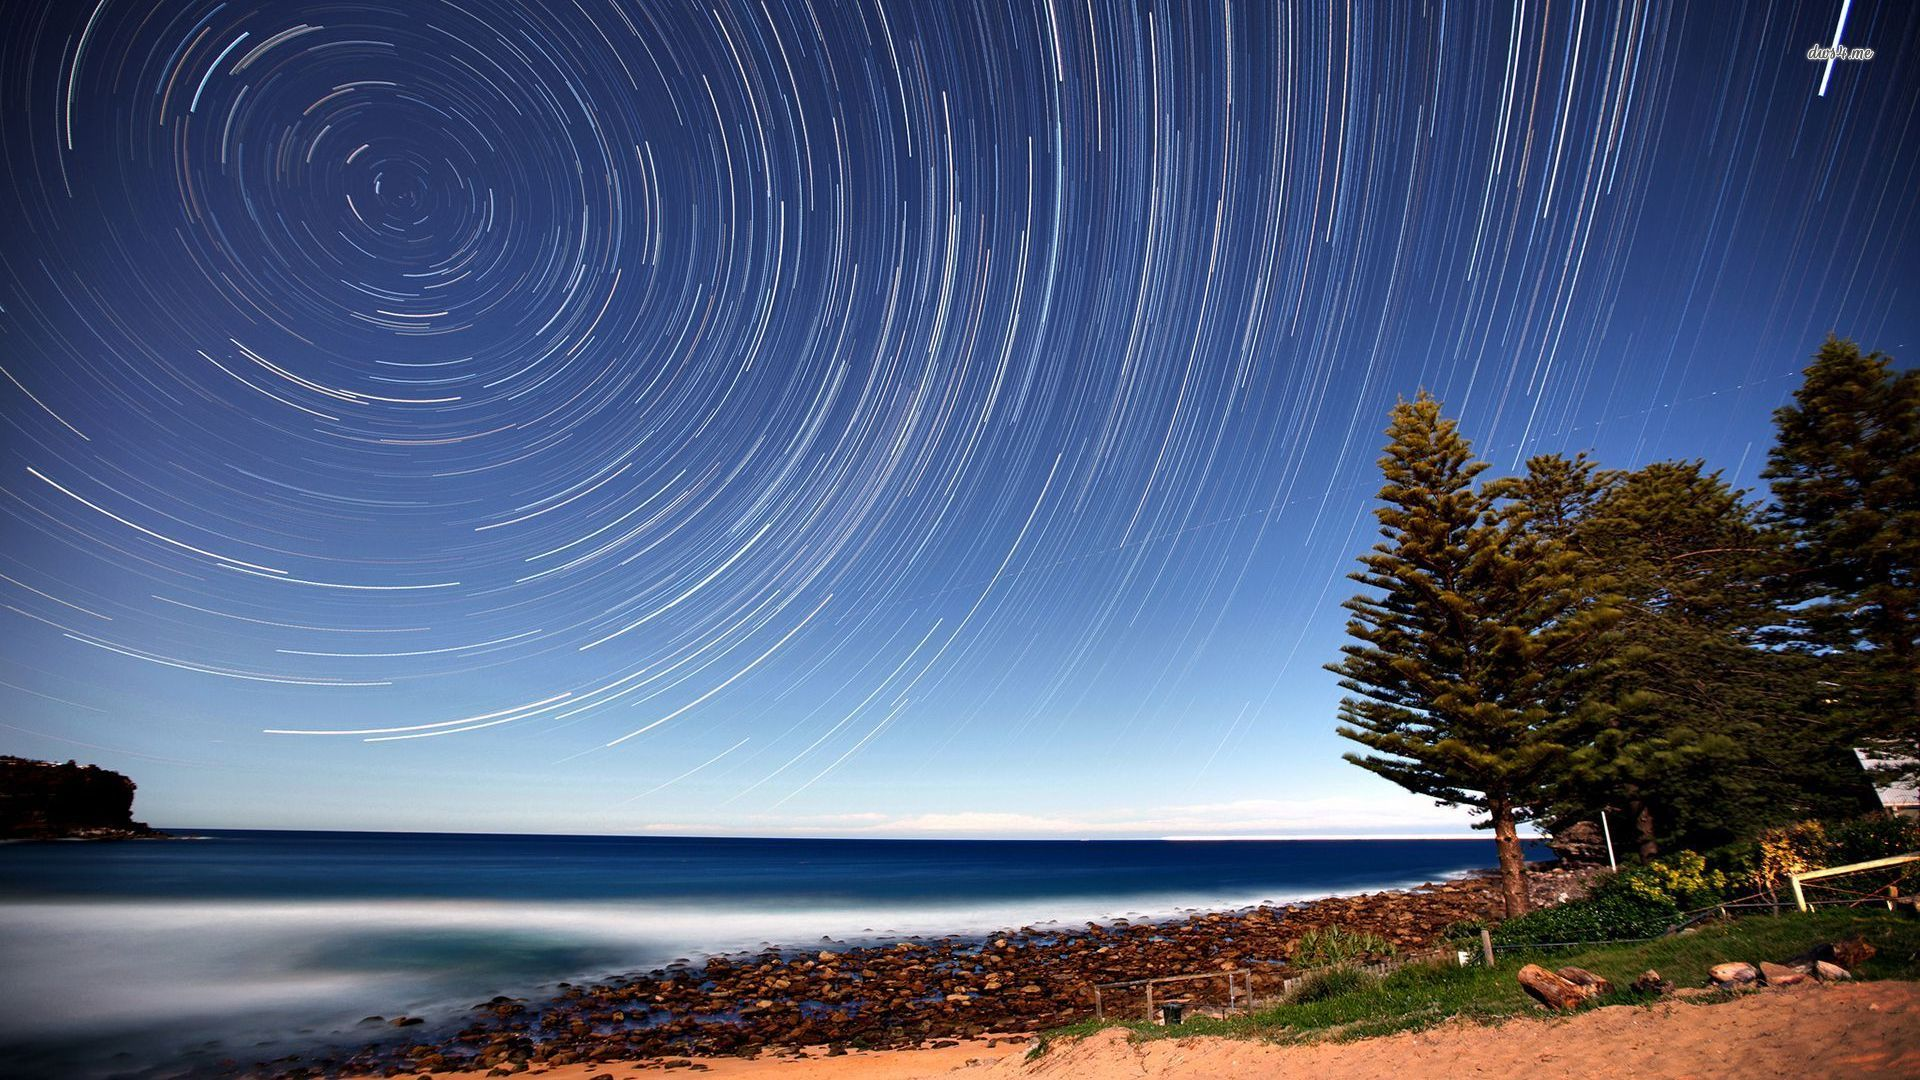 Avalon beach Australia wallpaper   Beach wallpapers   22831 1920x1080